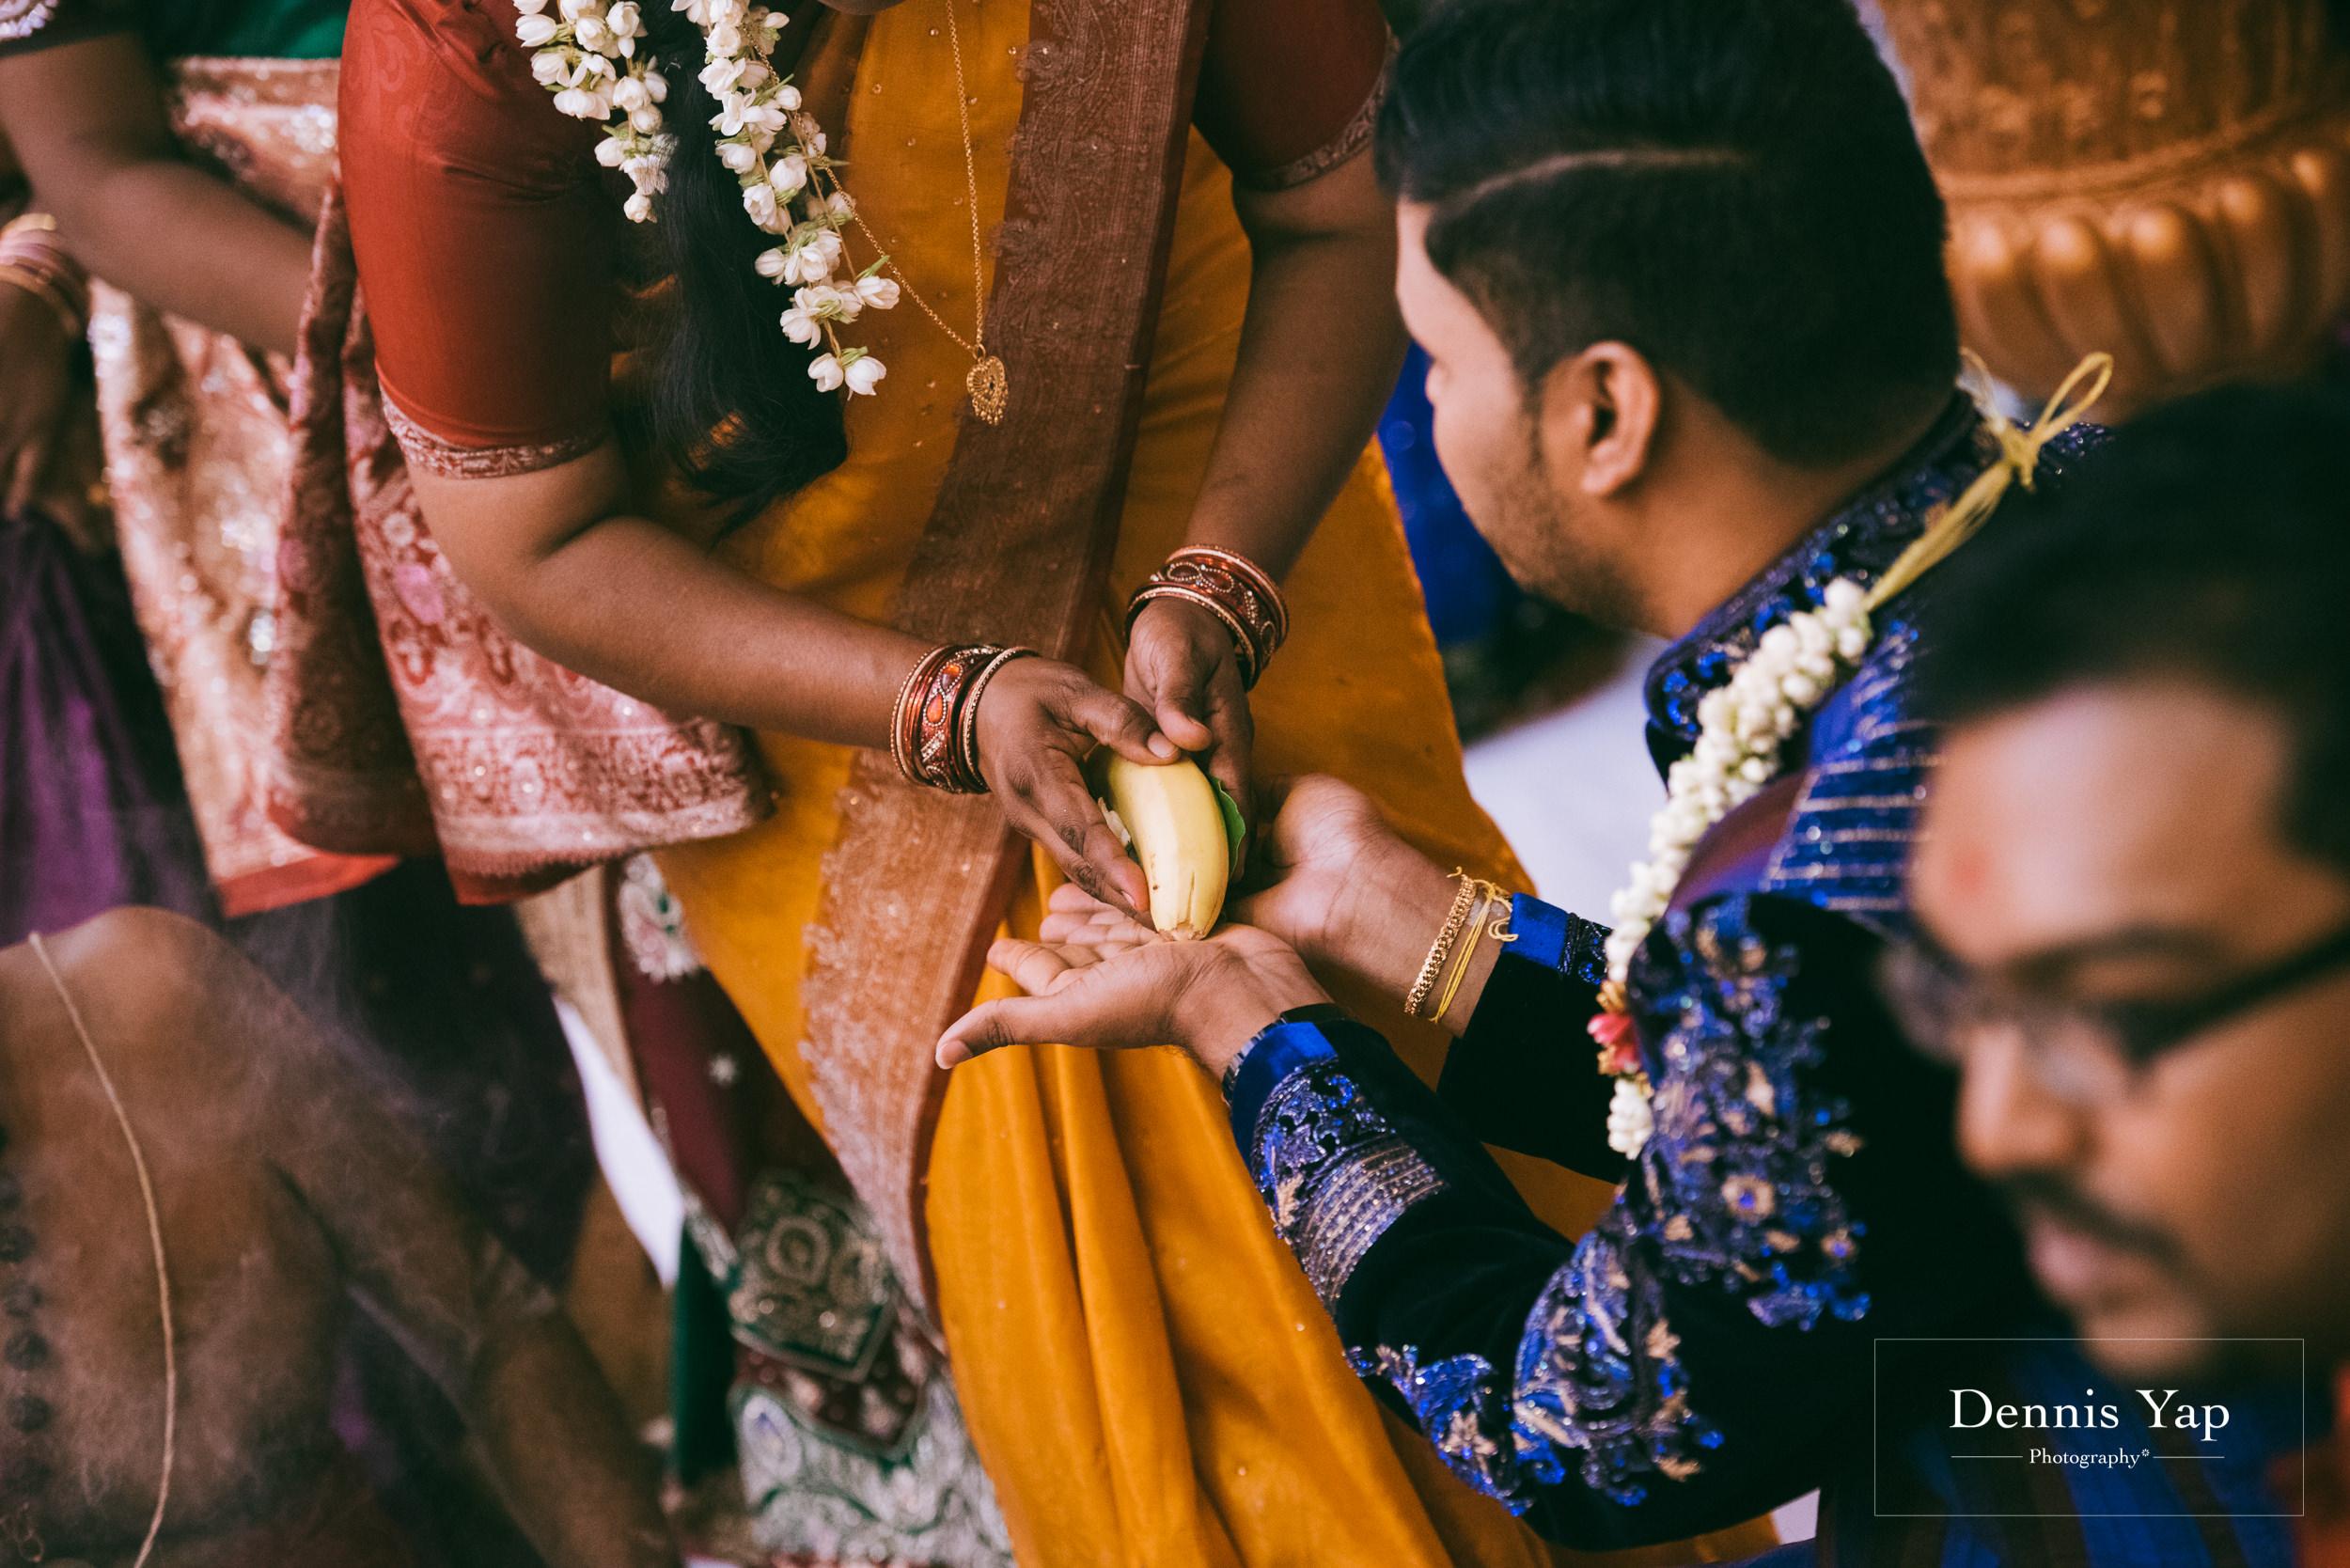 puvaneswaran cangitaa indian wedding ceremony ideal convention dennis yap photography malaysia-15.jpg